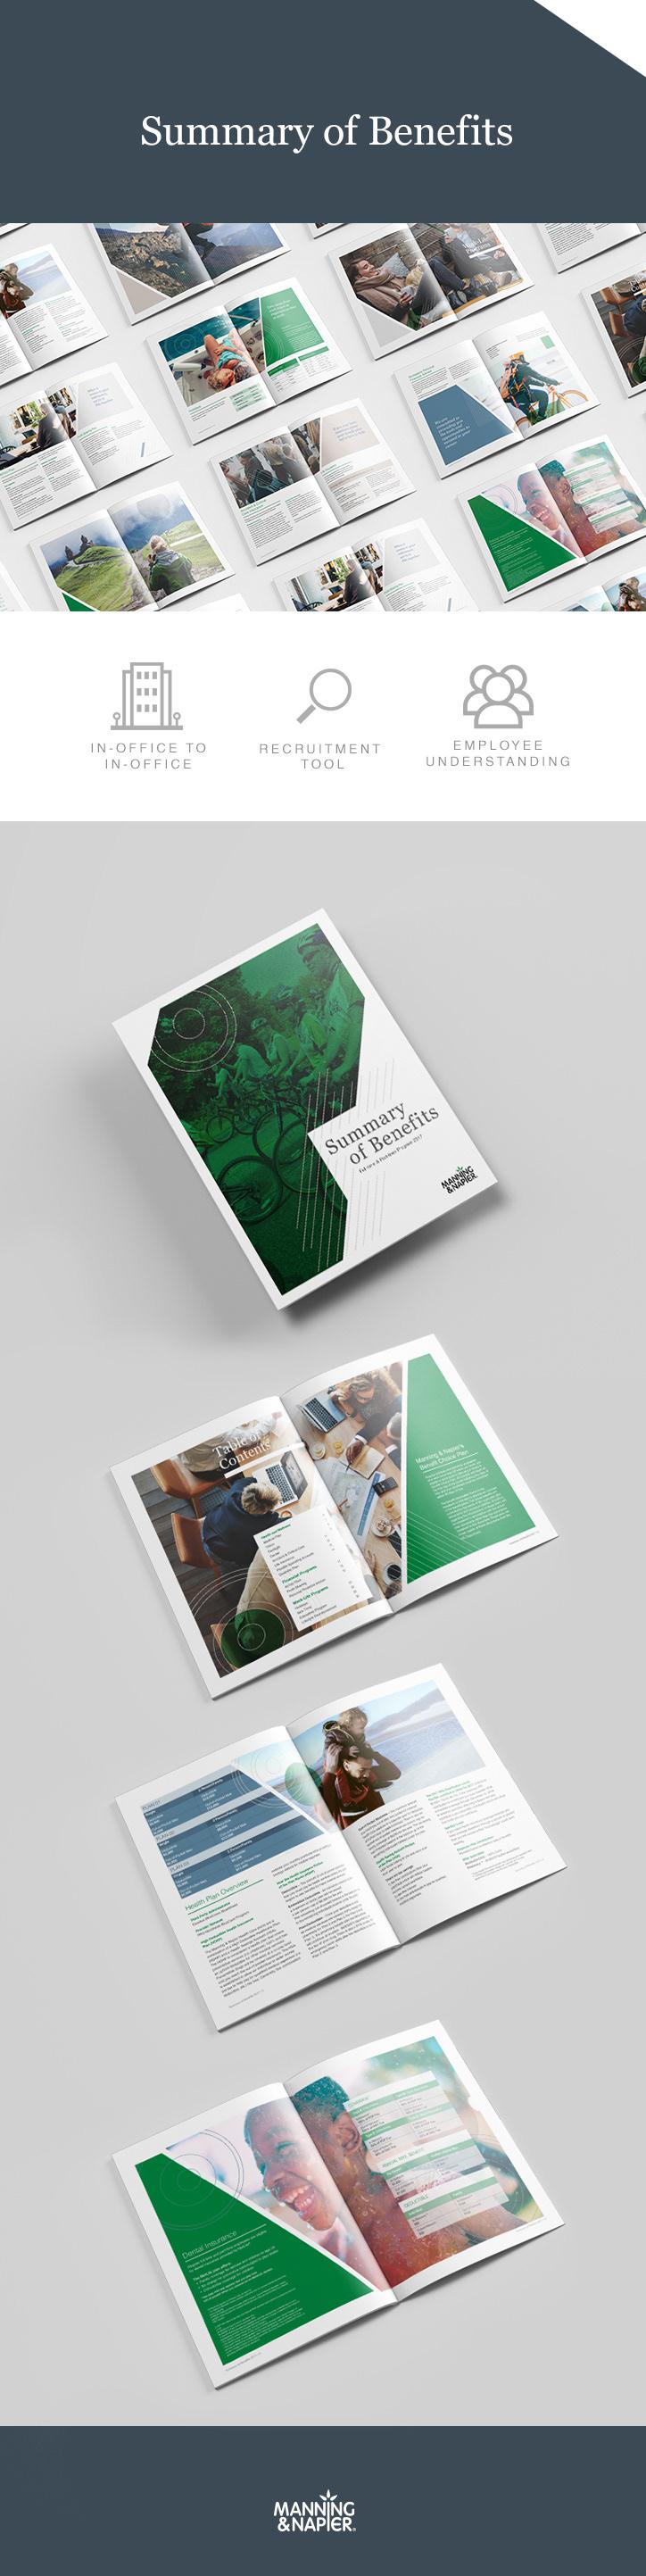 print,Guide,benefits,Handbook,employee,rochester,finance,New York